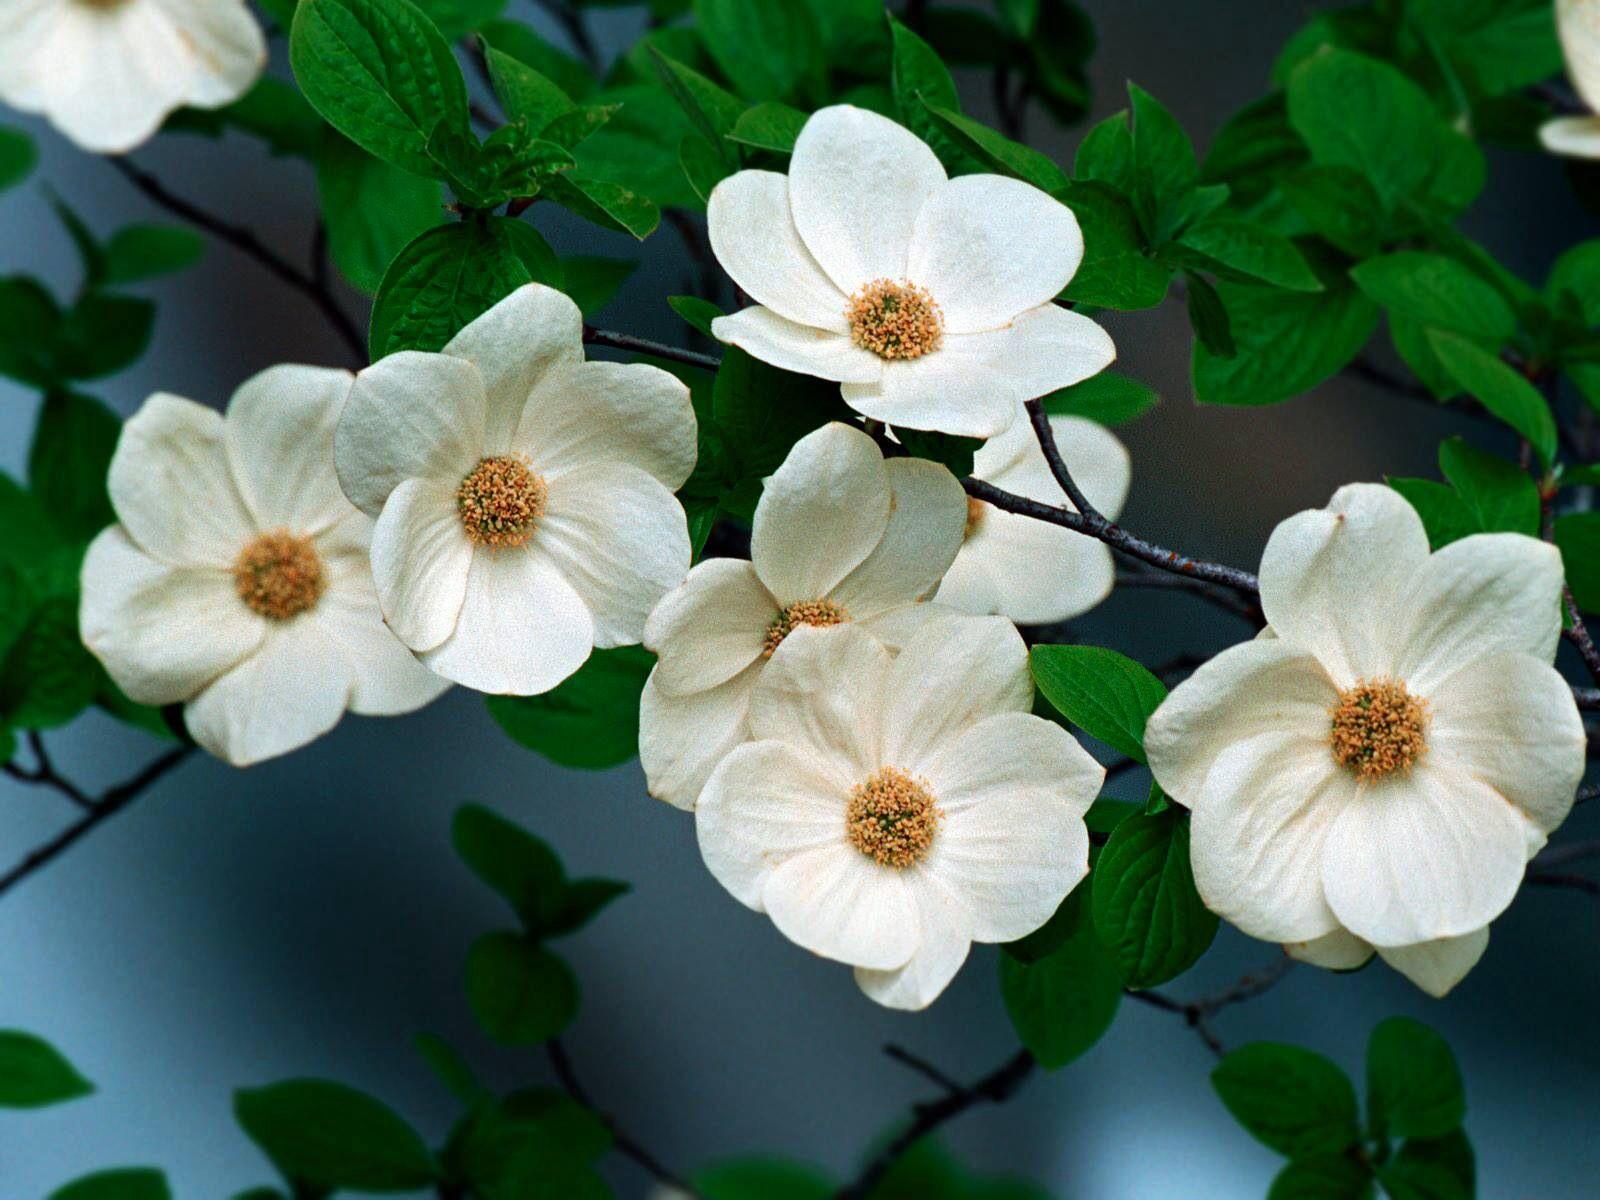 Pacific Dogwood flower emblem of British Columbia Canada | Dogwood ...